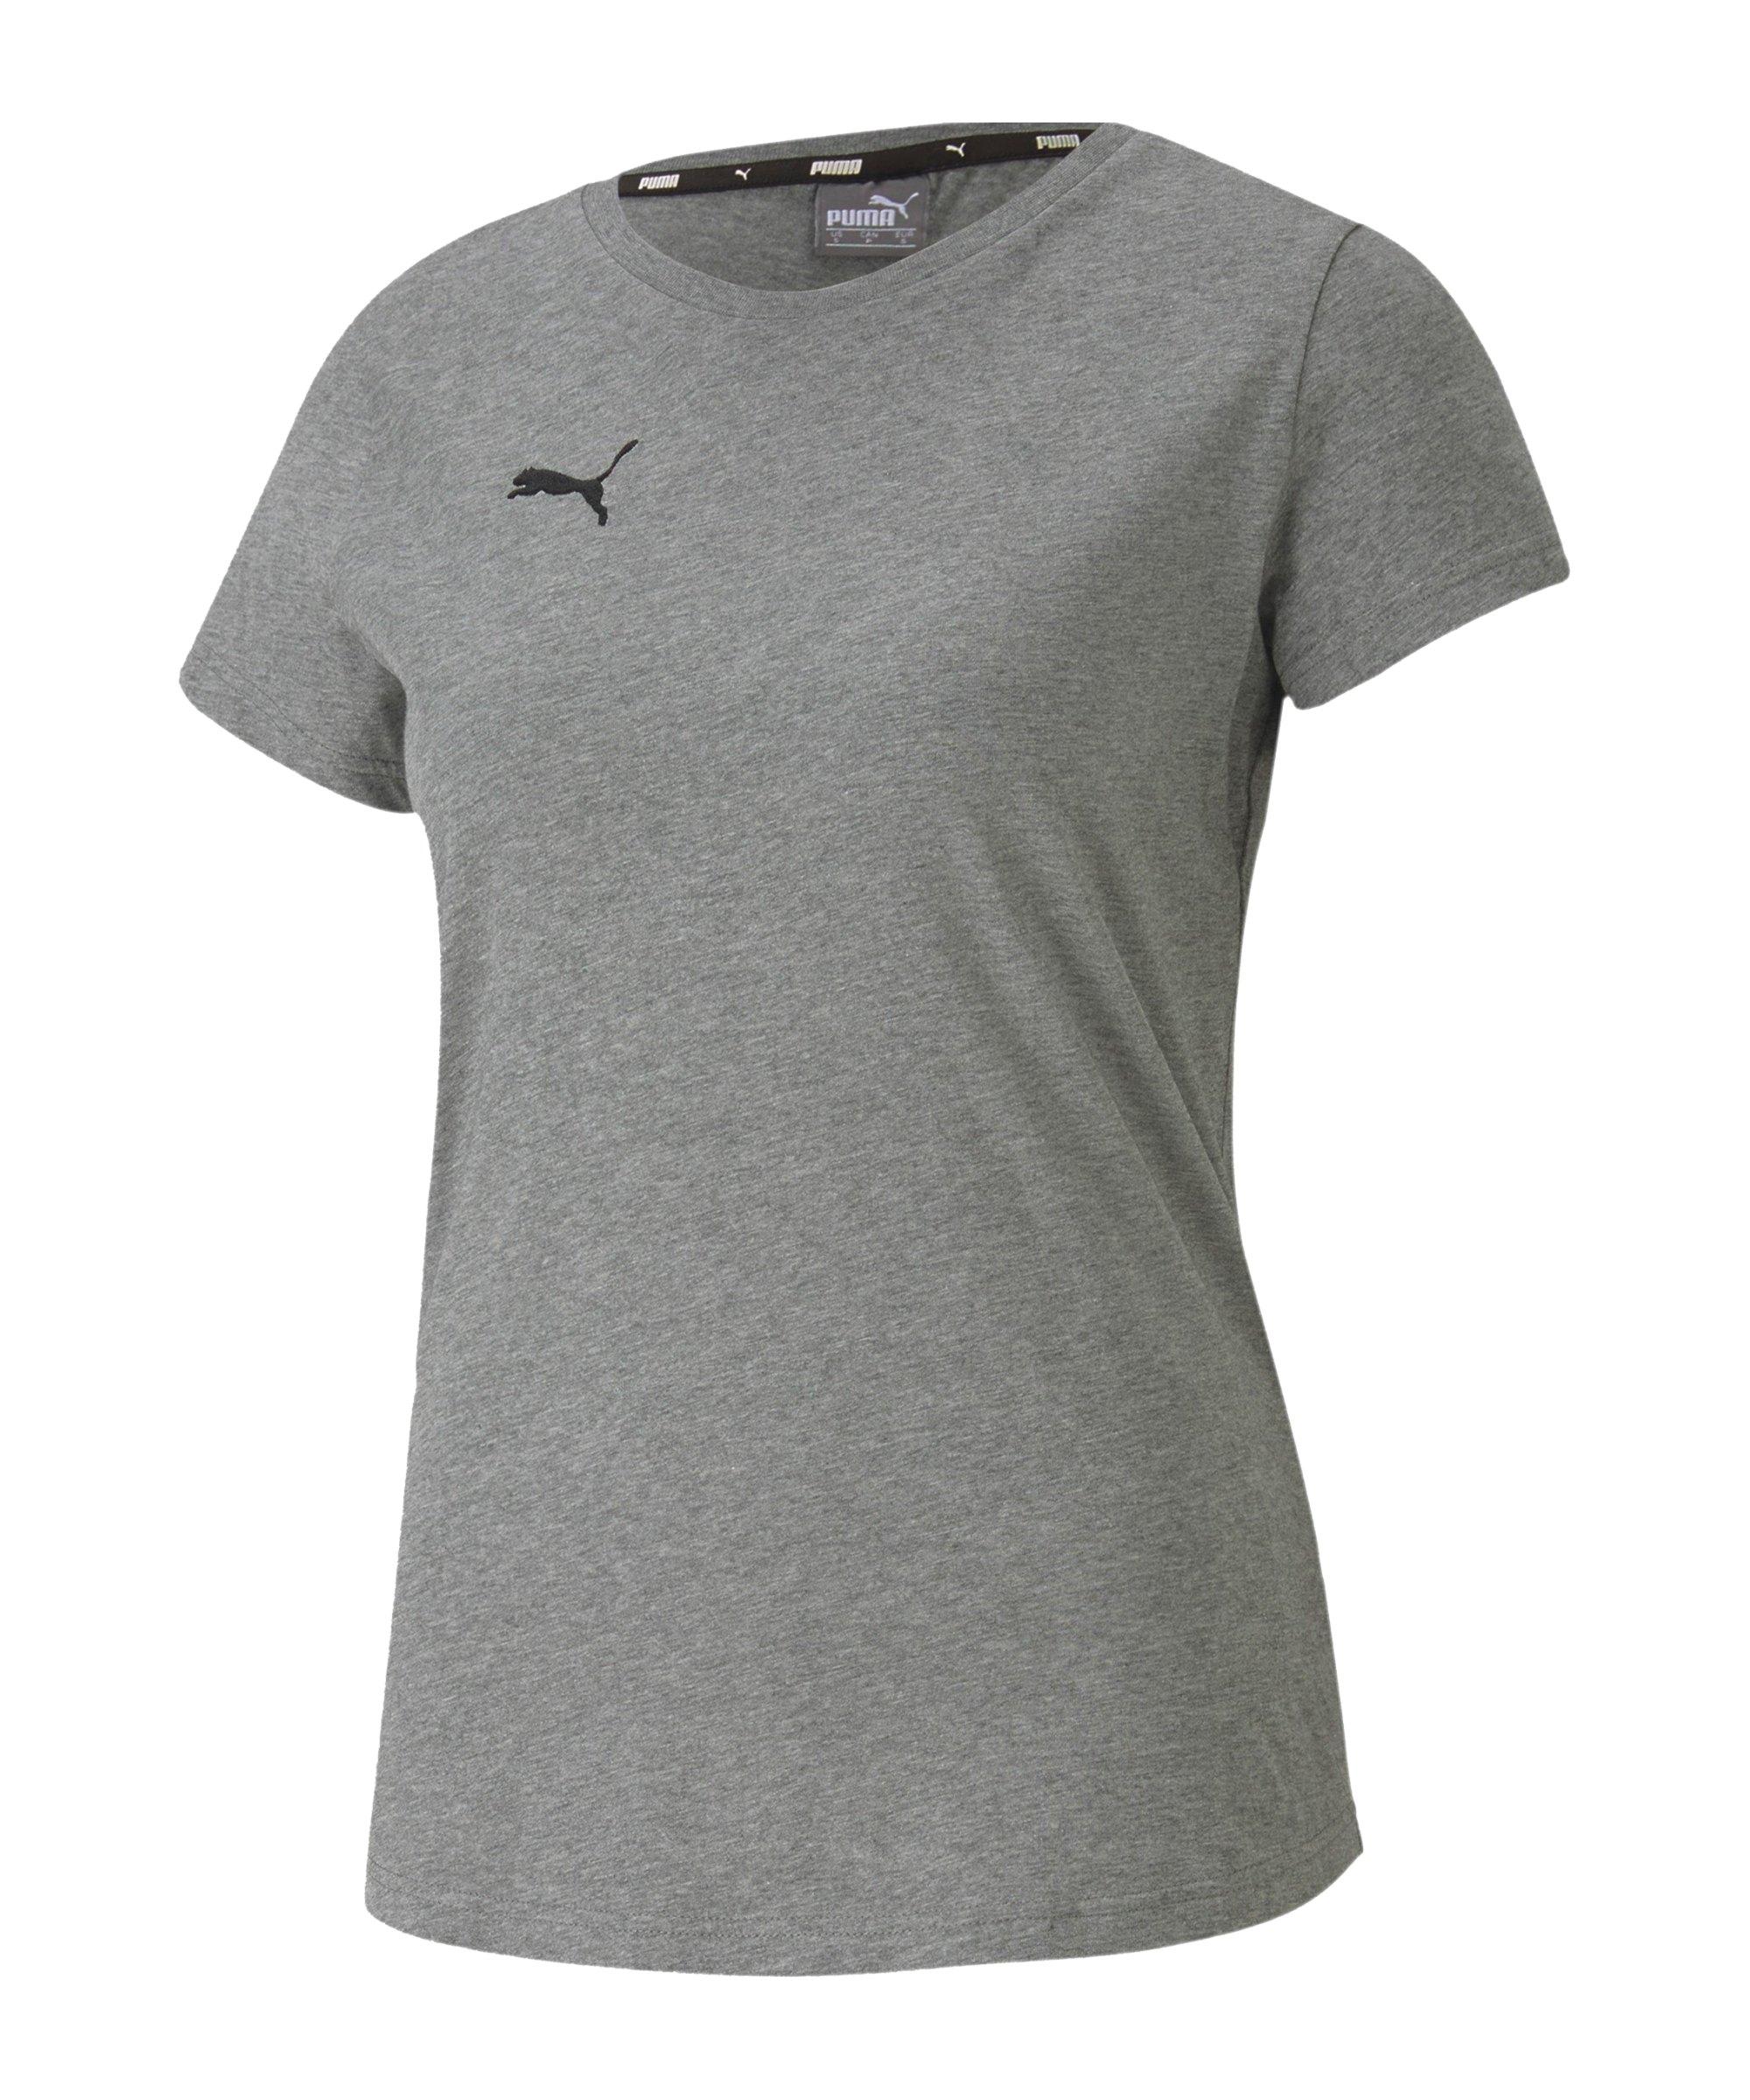 PUMA teamGOAL 23 Casuals T-Shirt Damen Grau F33 - grau